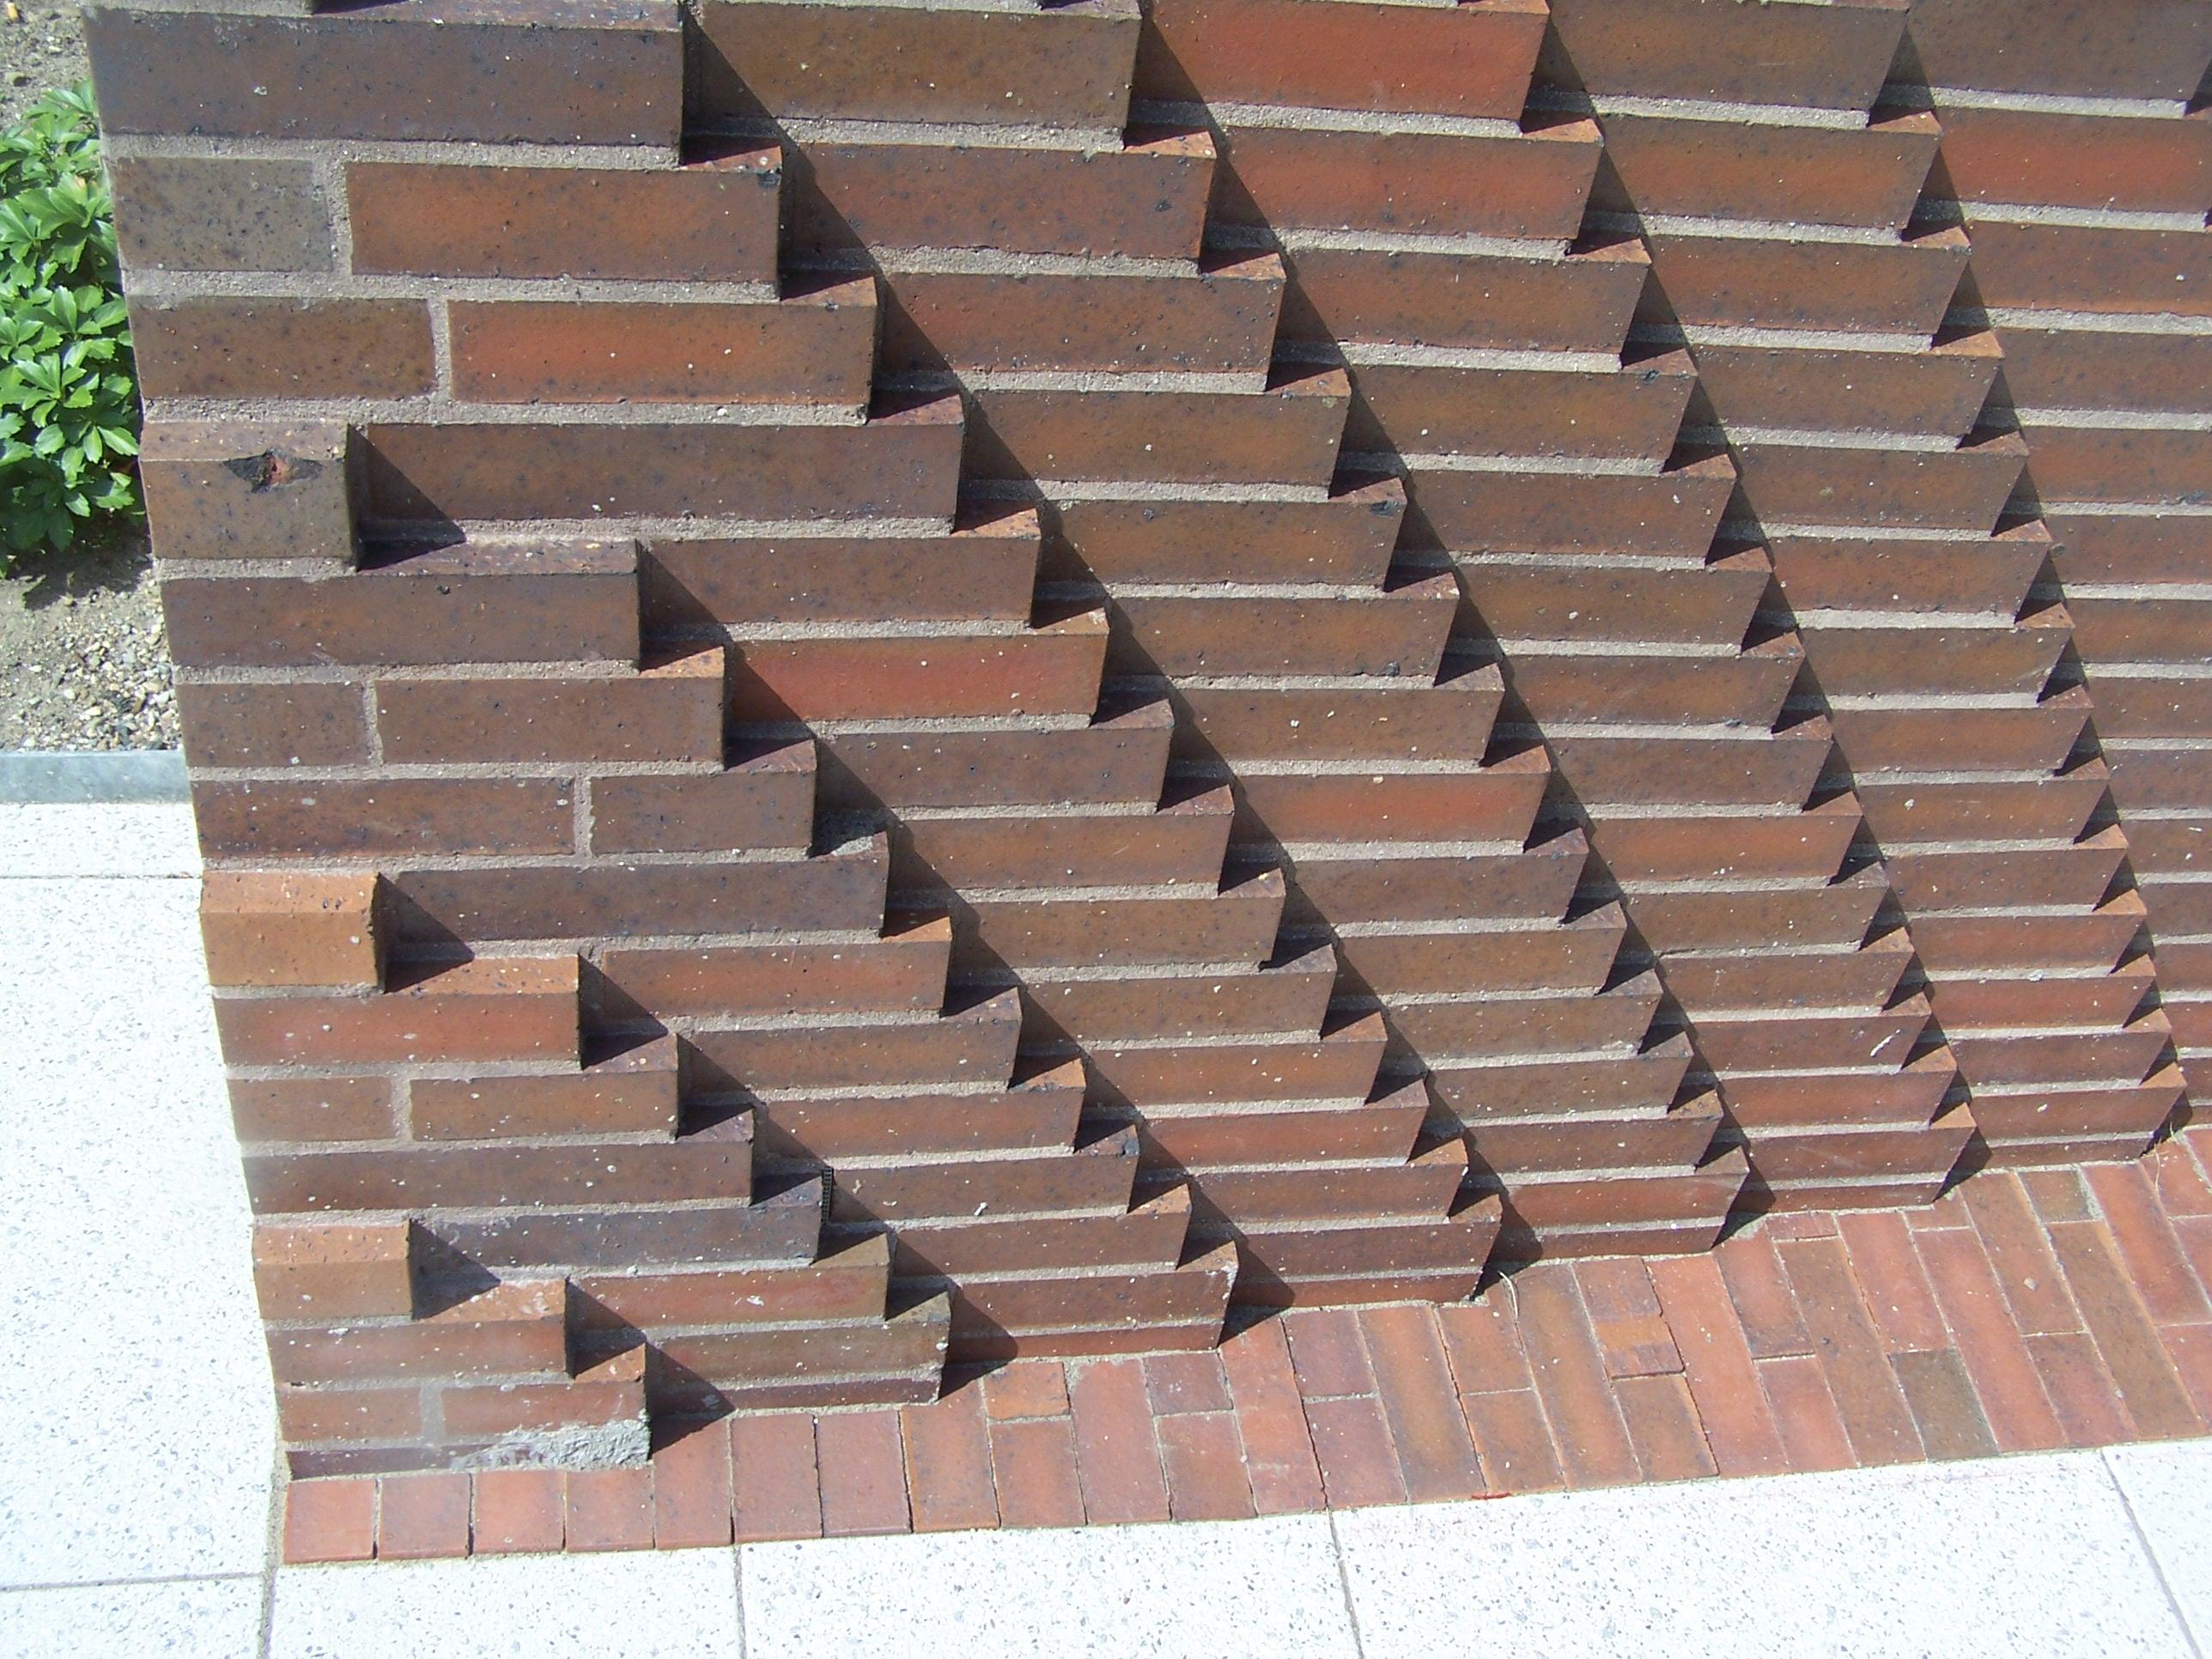 Brick | International Masonry Institute